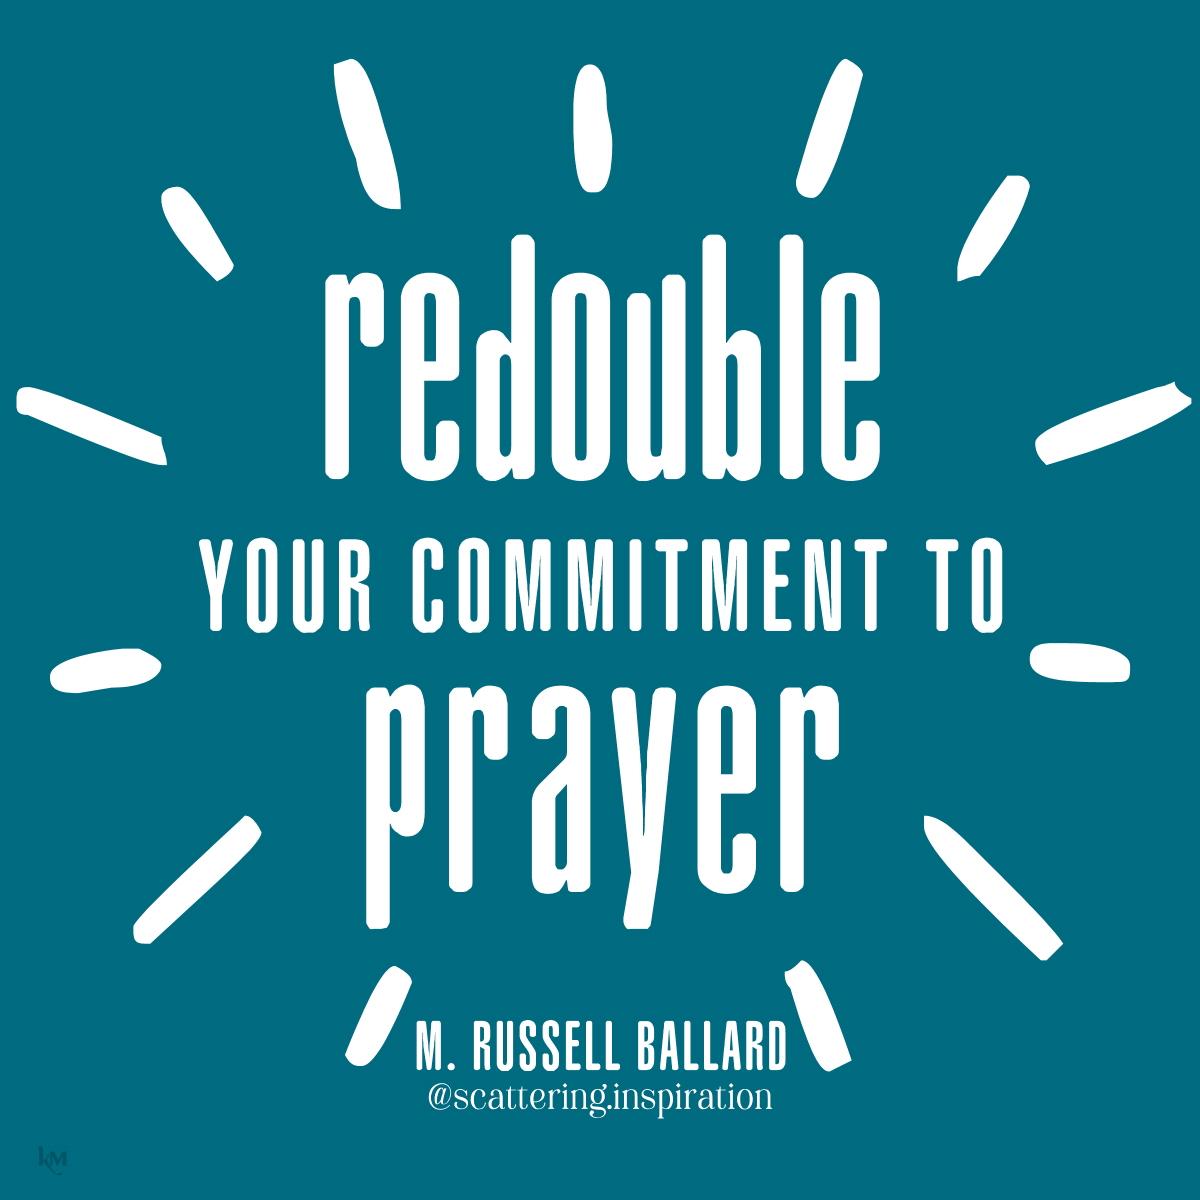 redouble commitment